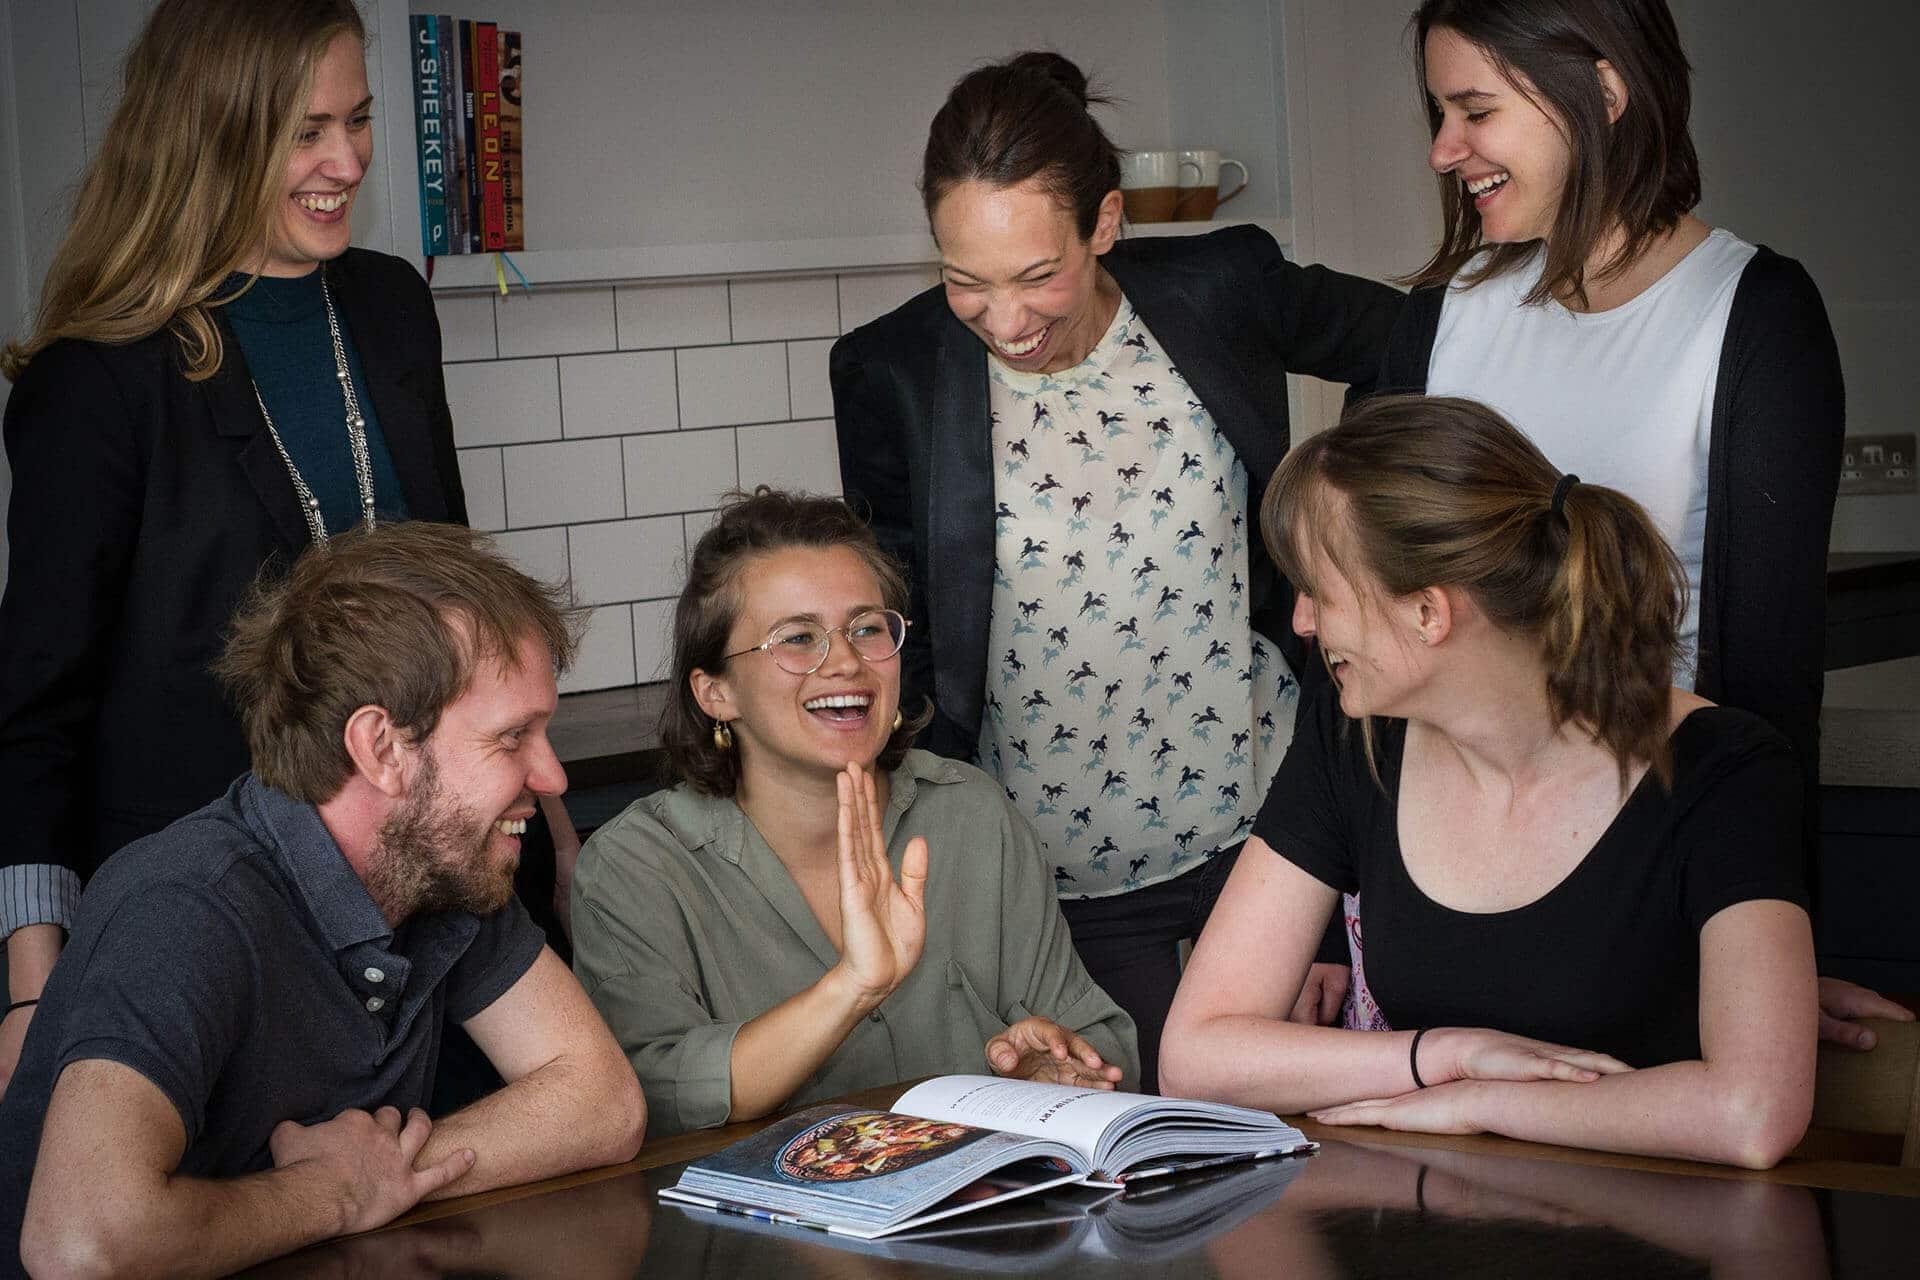 Office Team Photo May 2016 - Fun